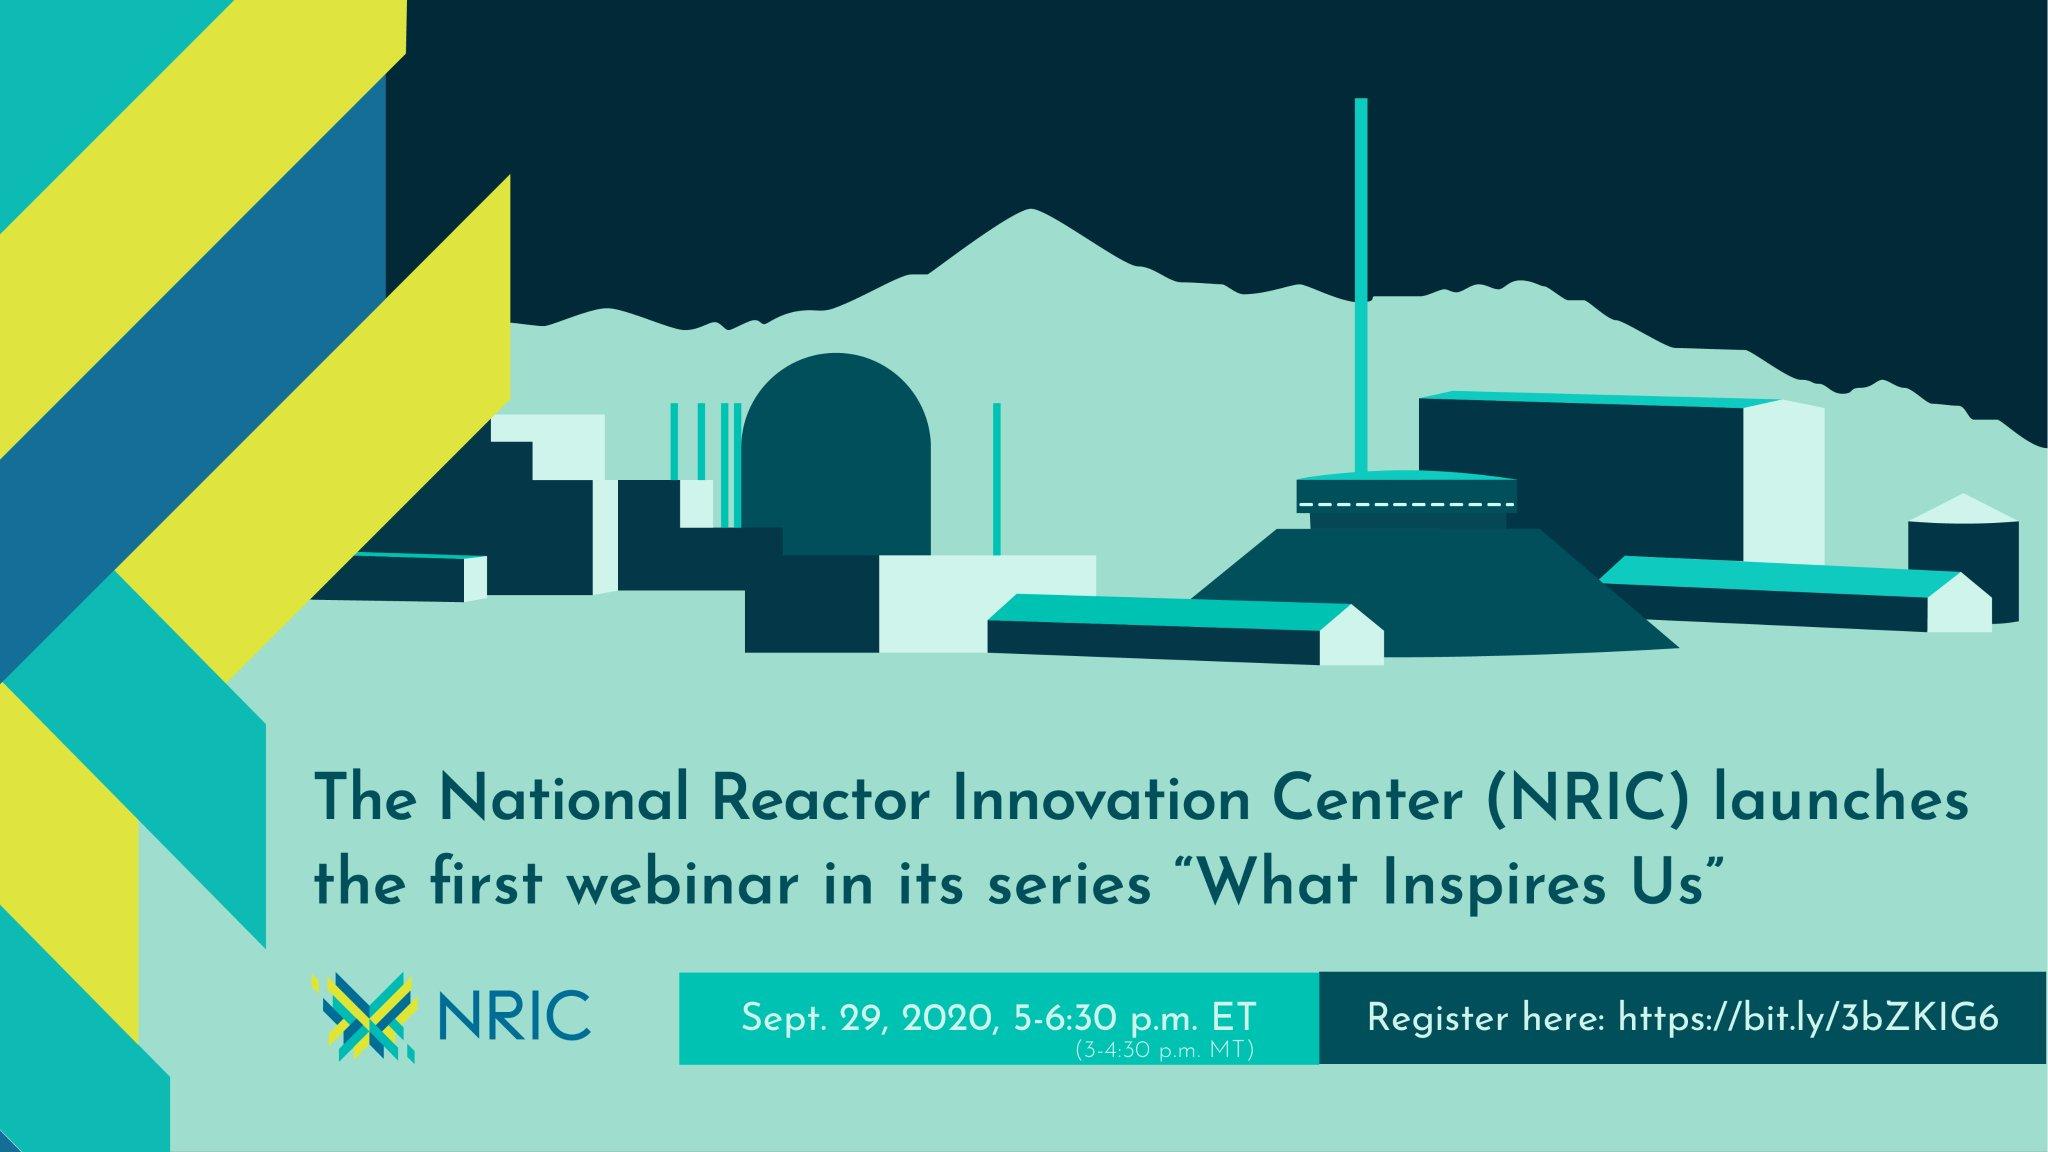 NRIC image